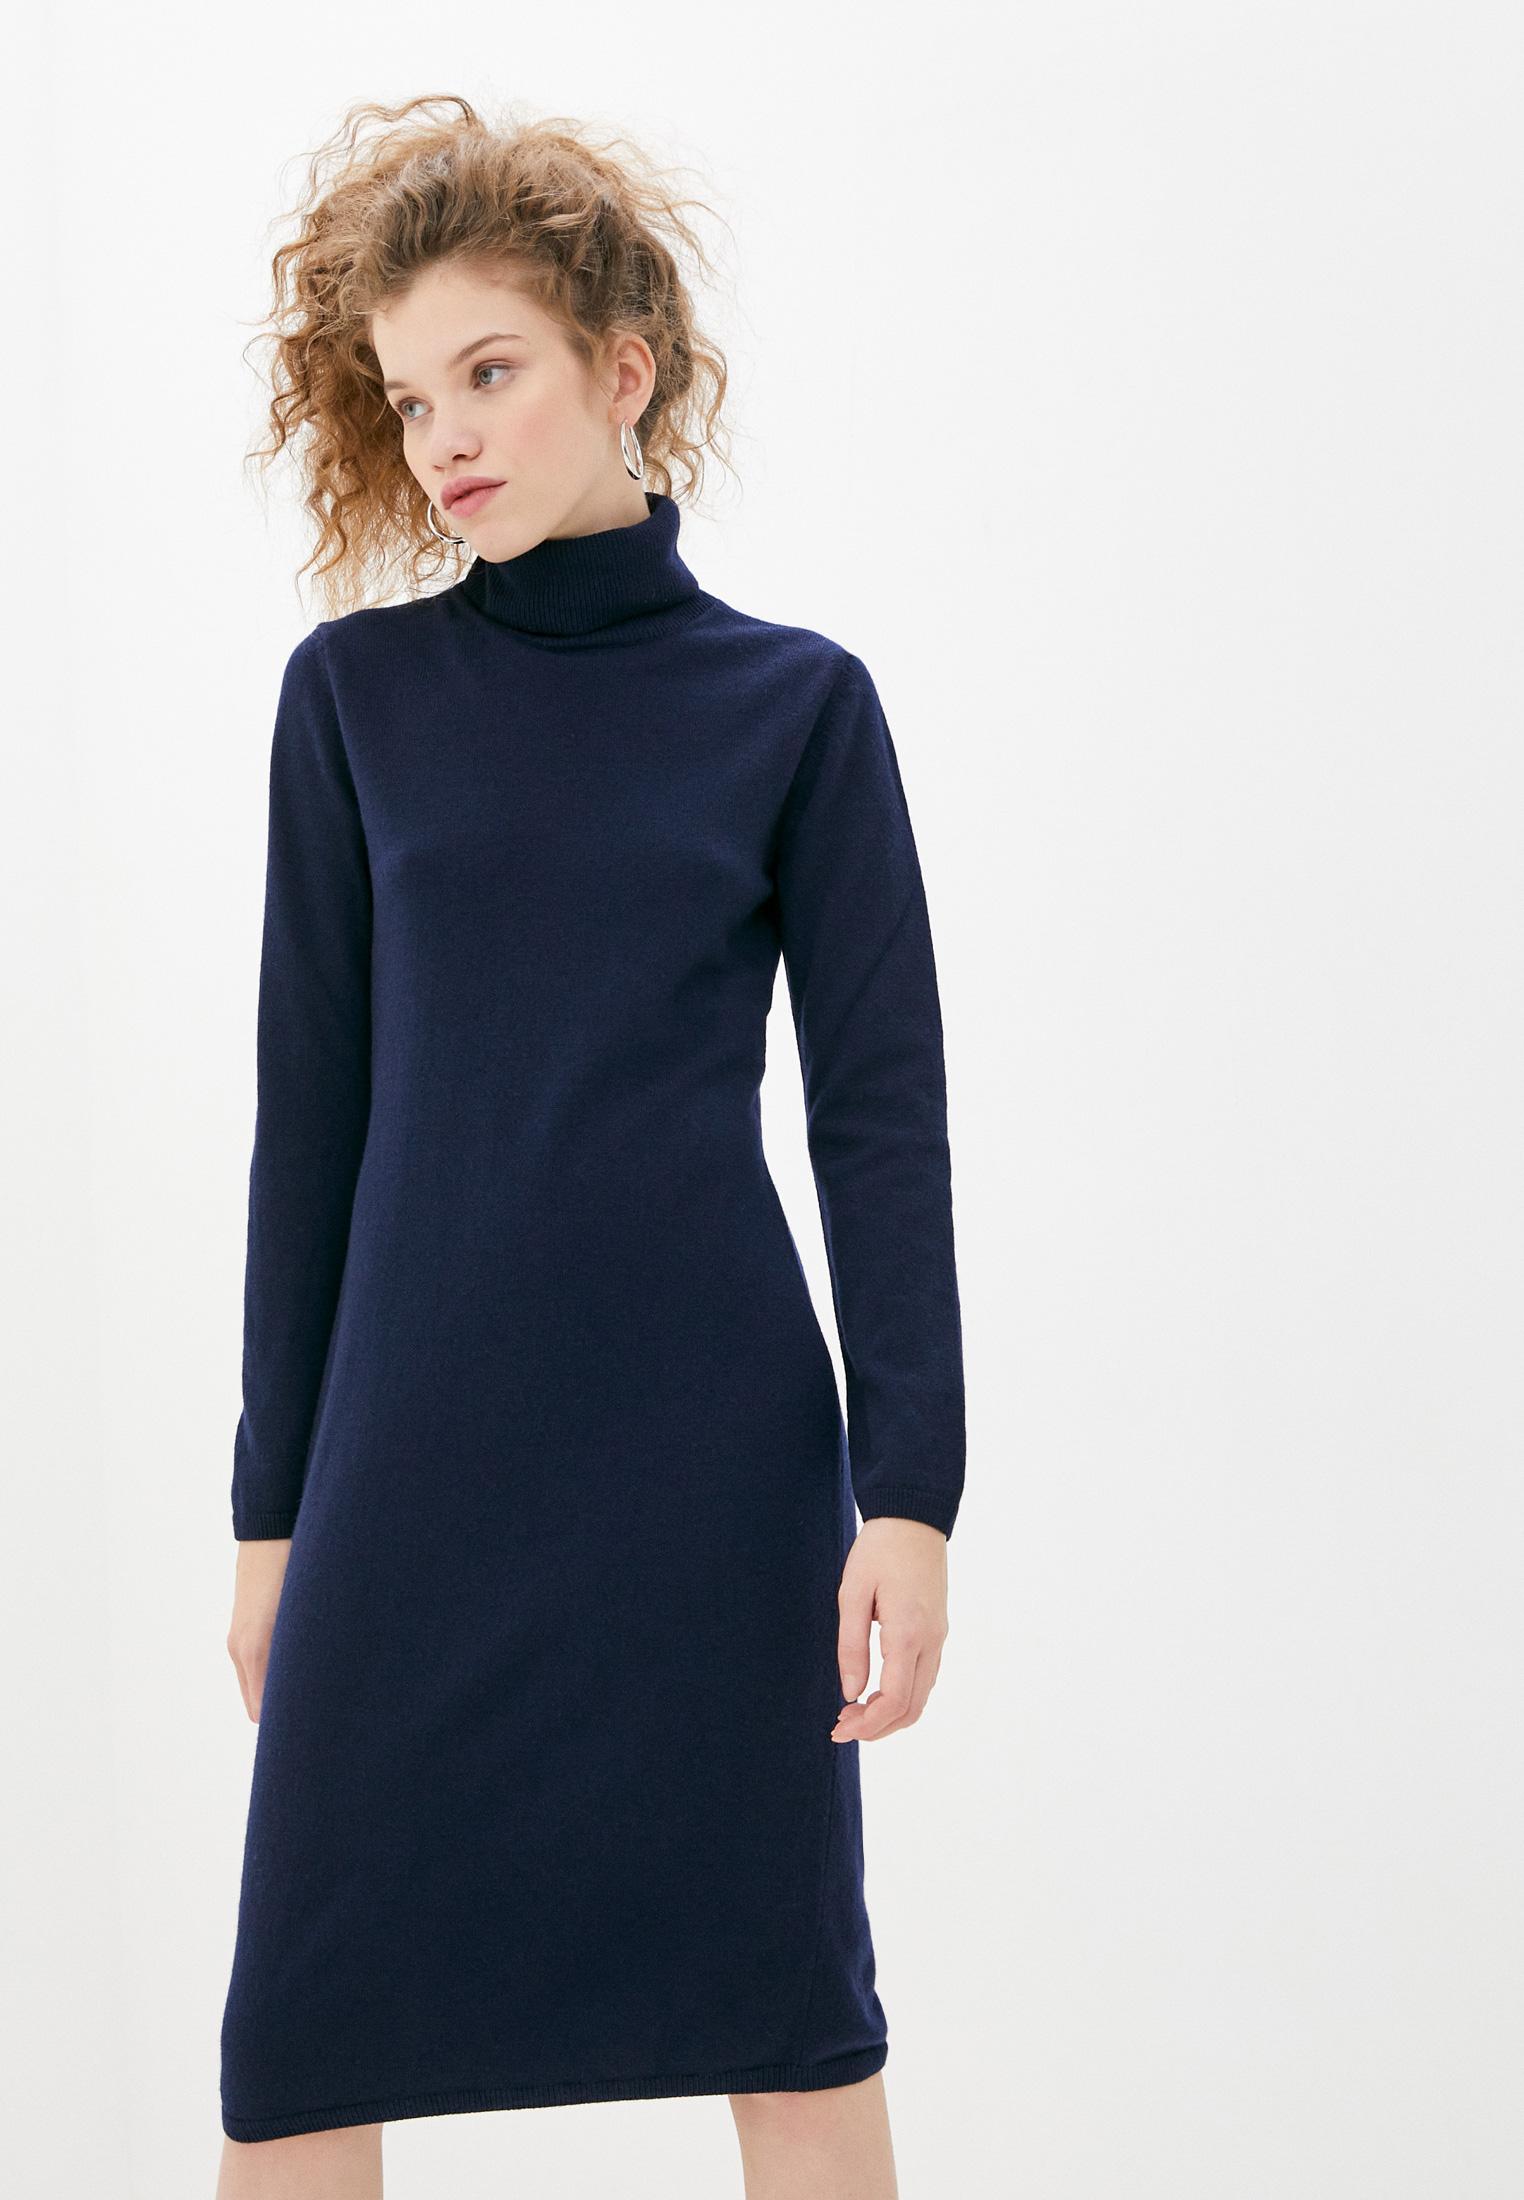 Вязаное платье United Colors of Benetton (Юнайтед Колорс оф Бенеттон) 1044V2531